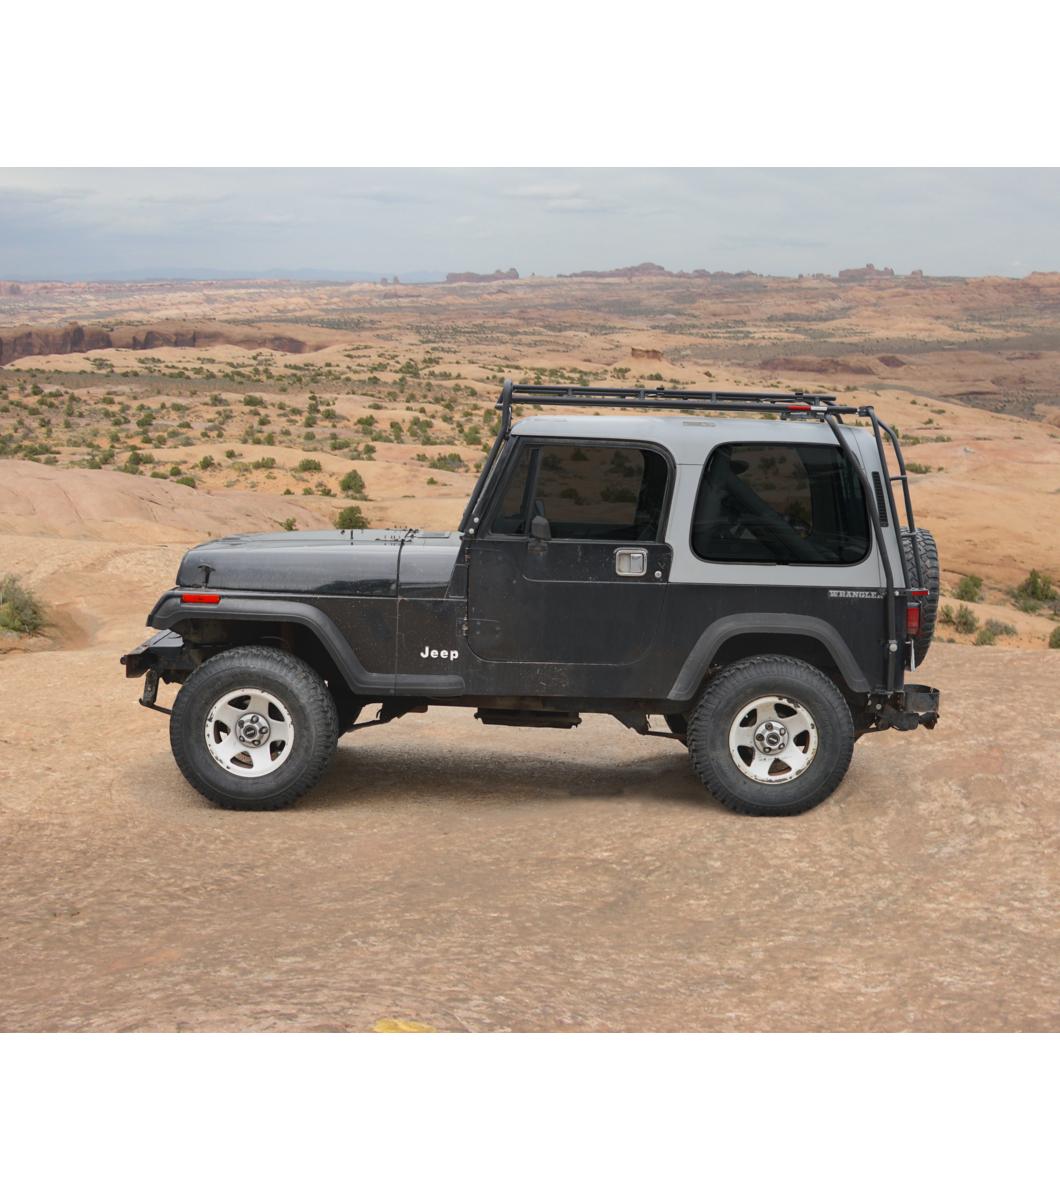 Gobi Roof Racks Jeep Tj Stealth Off Road